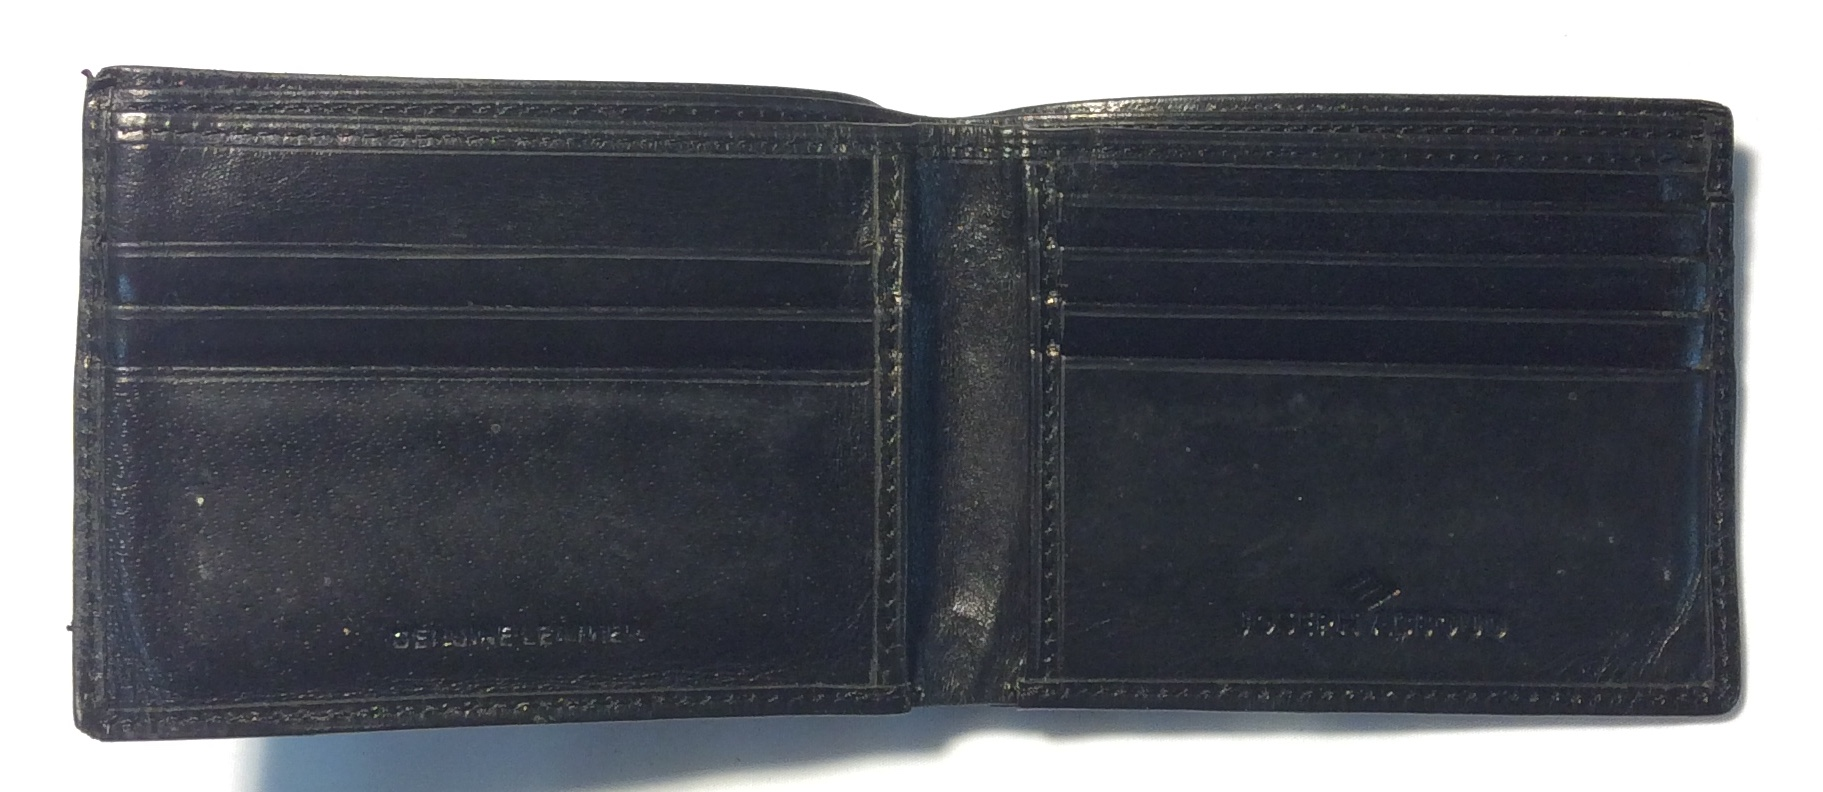 Joseph Abboud Black leather